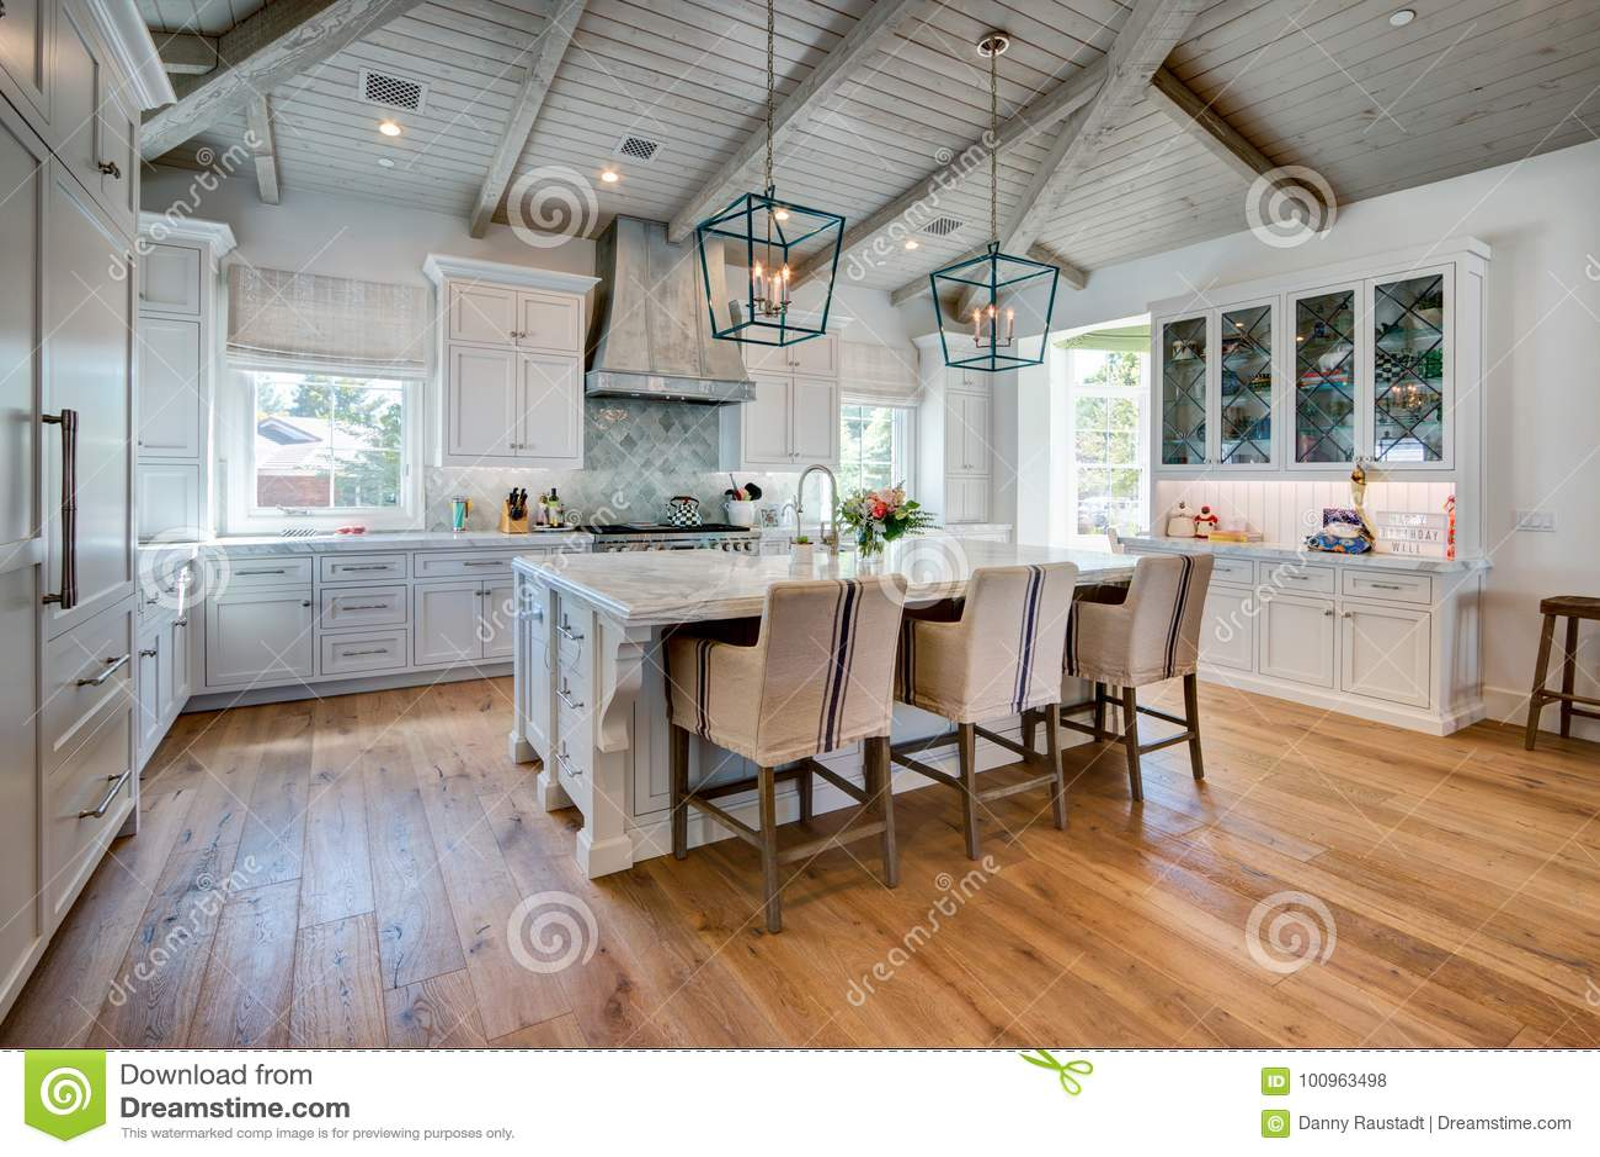 Ogromna jaskrawa nowożytna domowa kuchnia